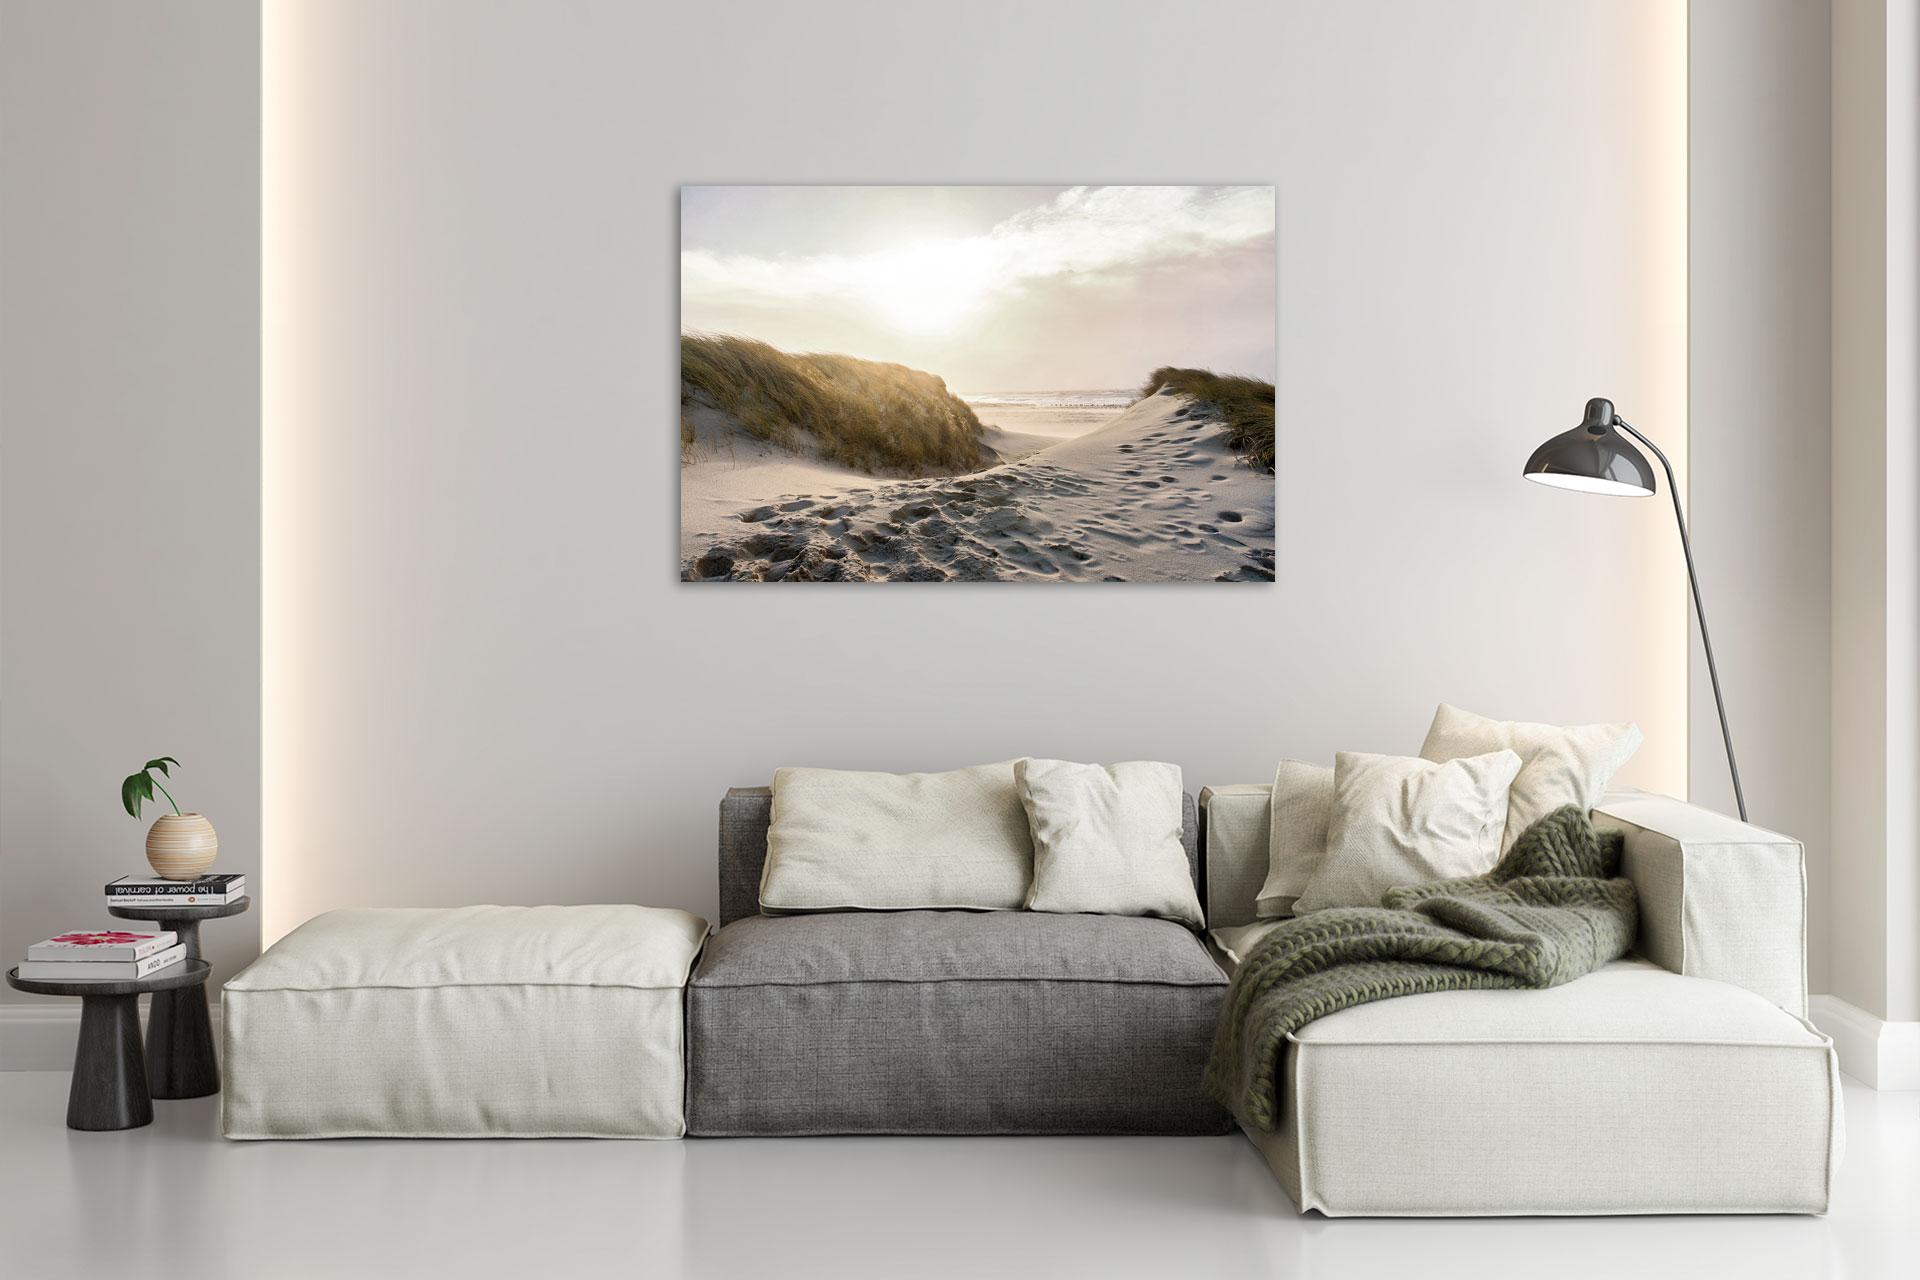 LCw500-sylt-duene-wandbild-bild-auf-leinwand-acrylglas-aludibond-wohnzimmer